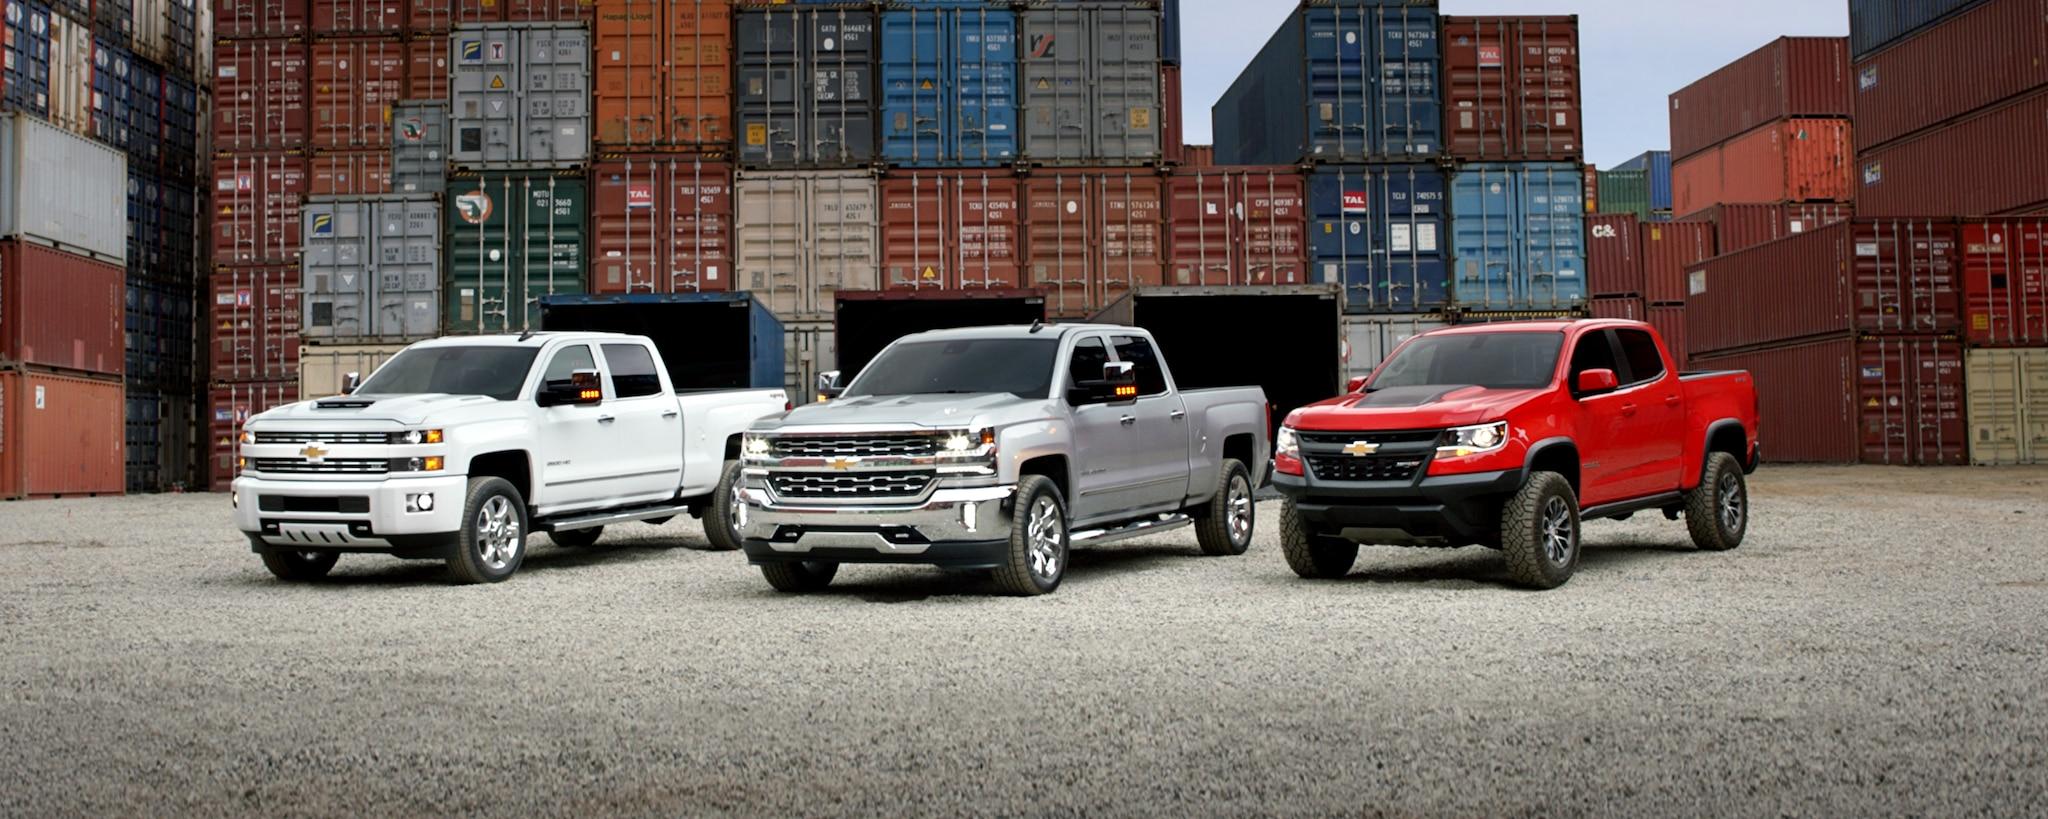 camionetas camionetas de trabajo 4x4 camionetas diésel chevrolet